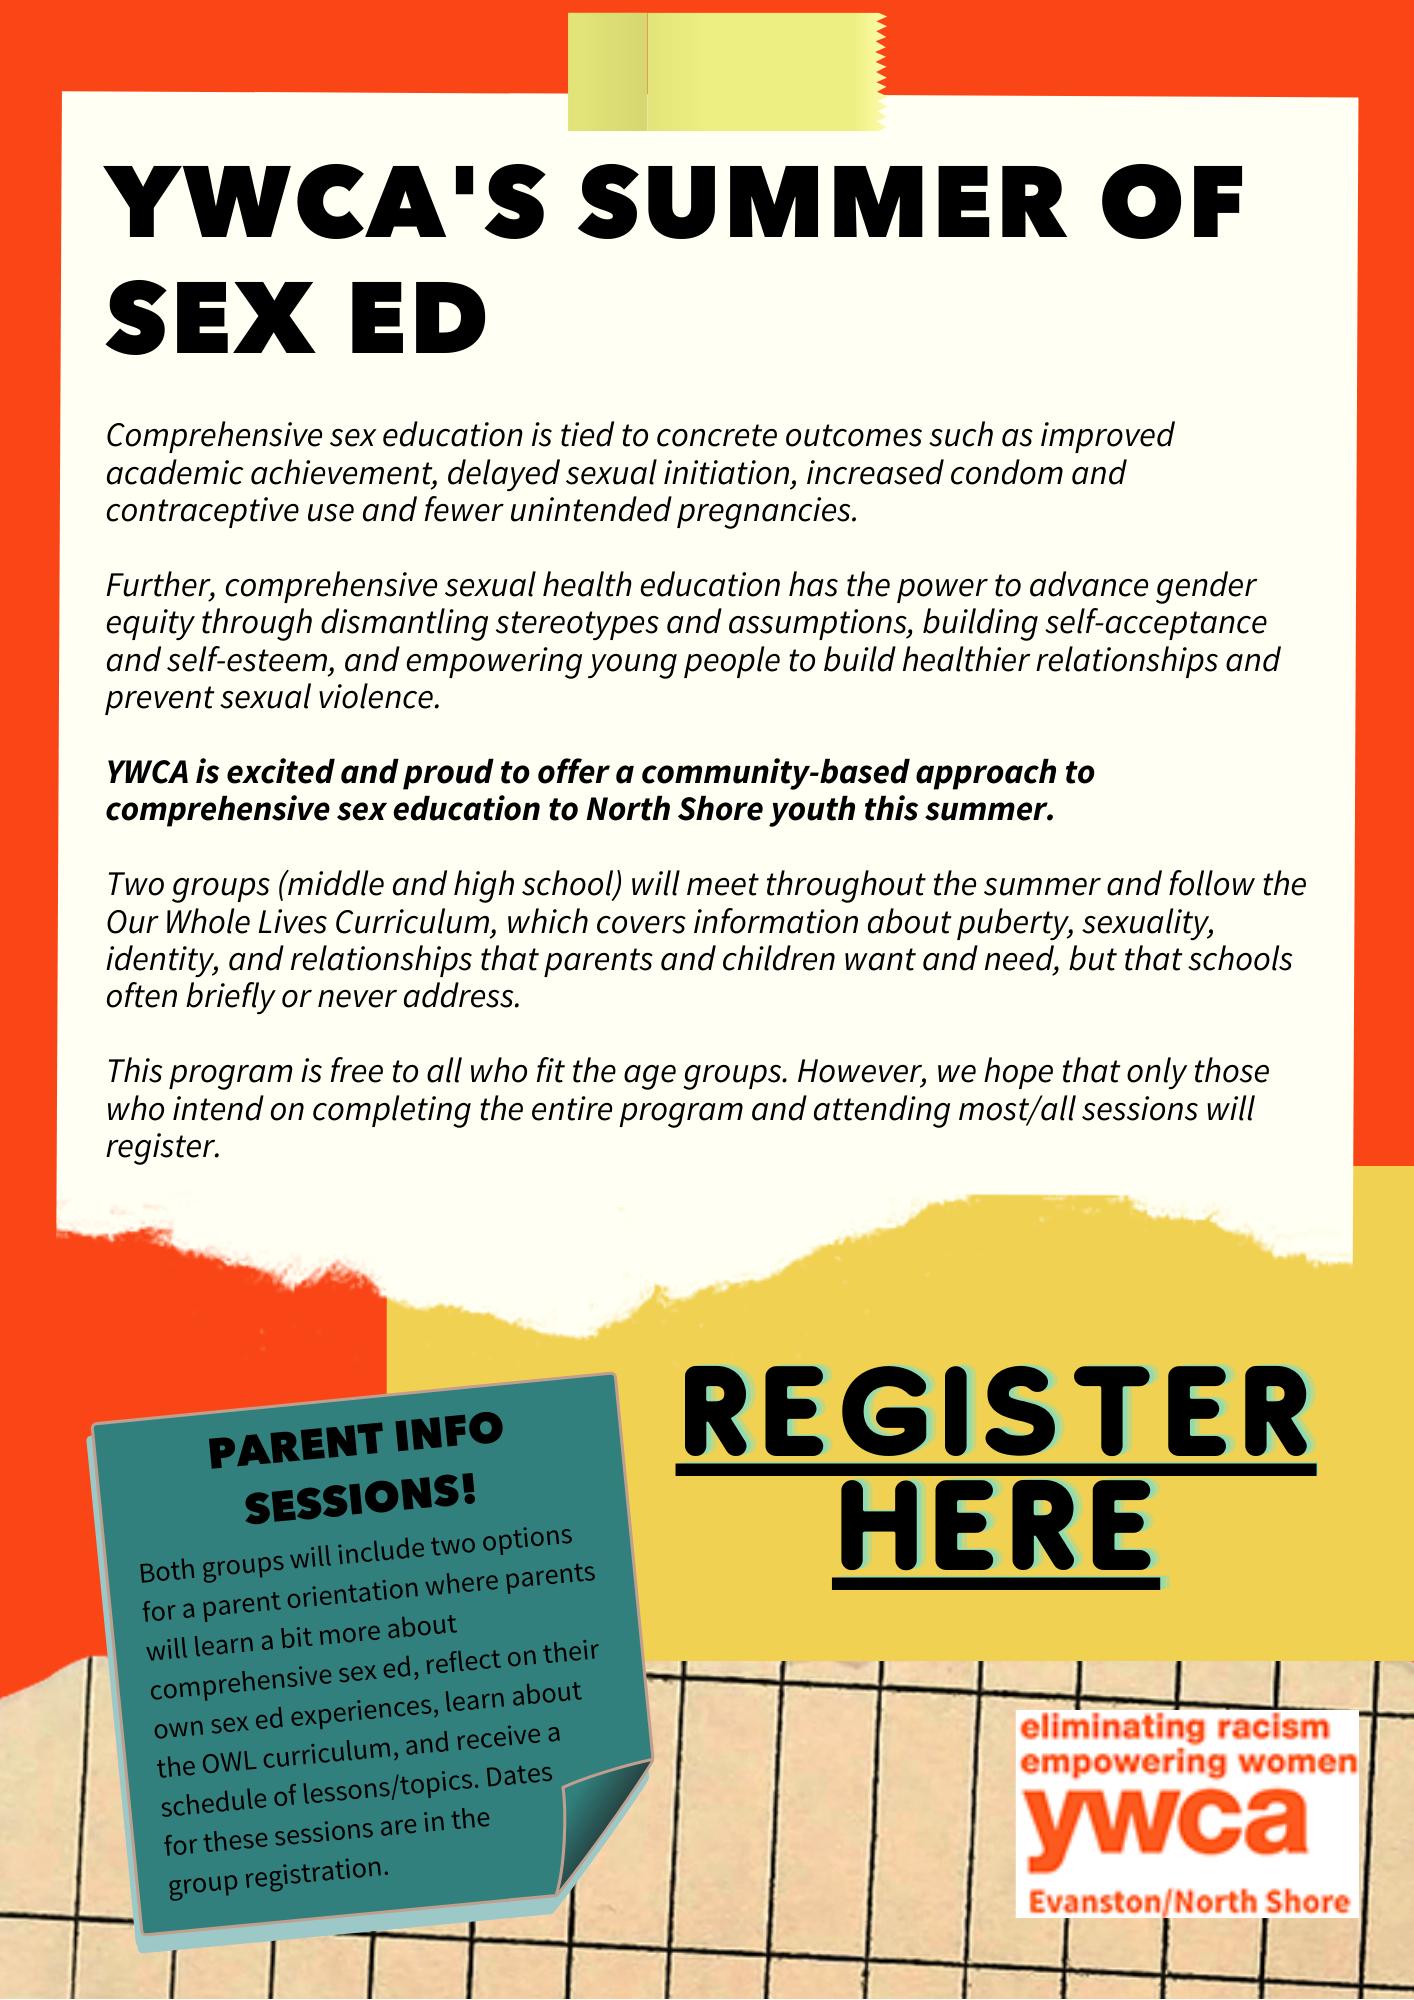 YWCA's Summer of Sex Ed Flyer